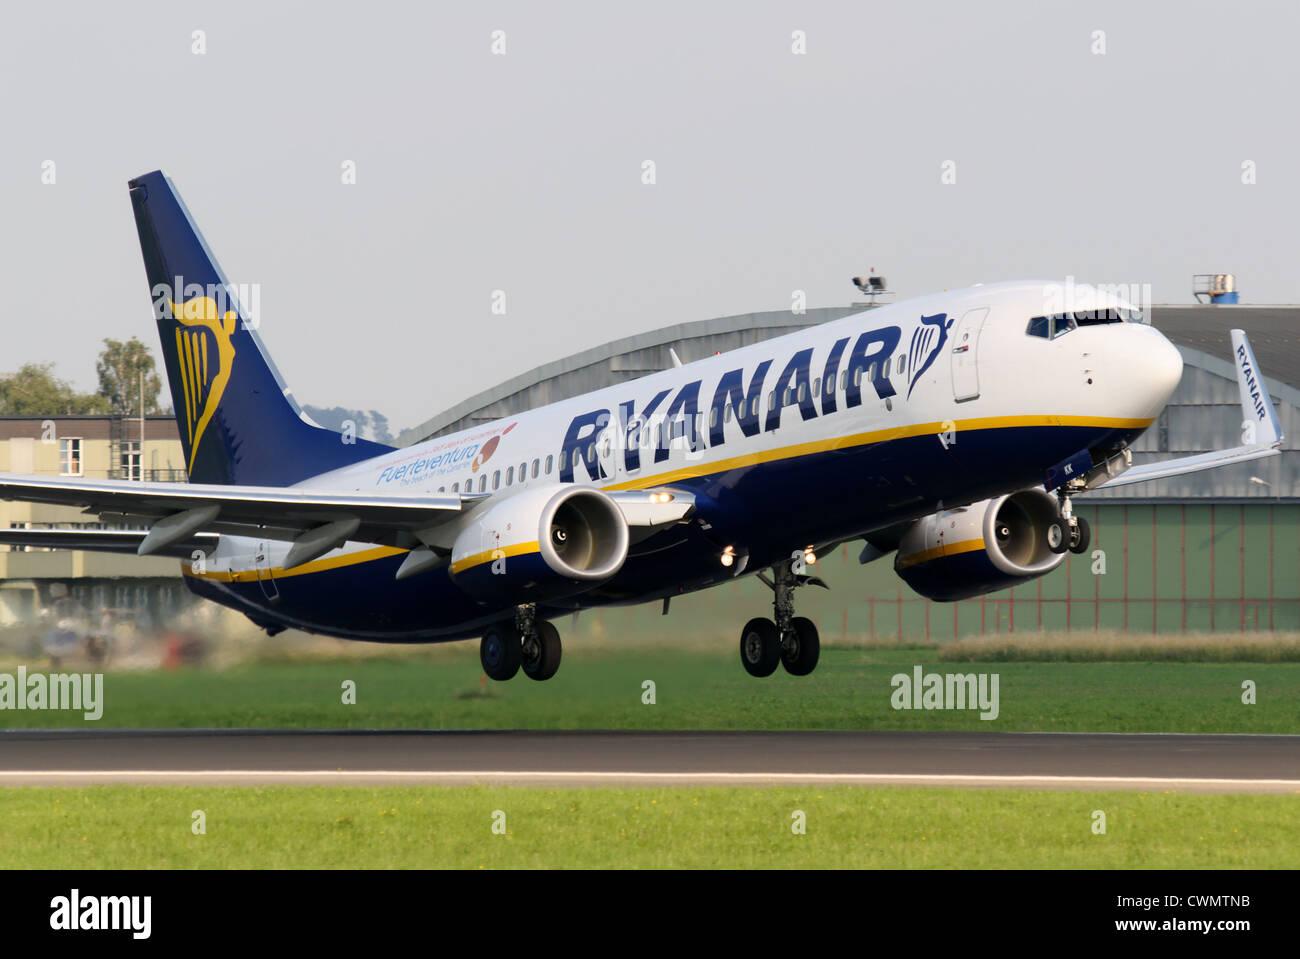 Boeing 737-800 of Ryanair - Stock Image